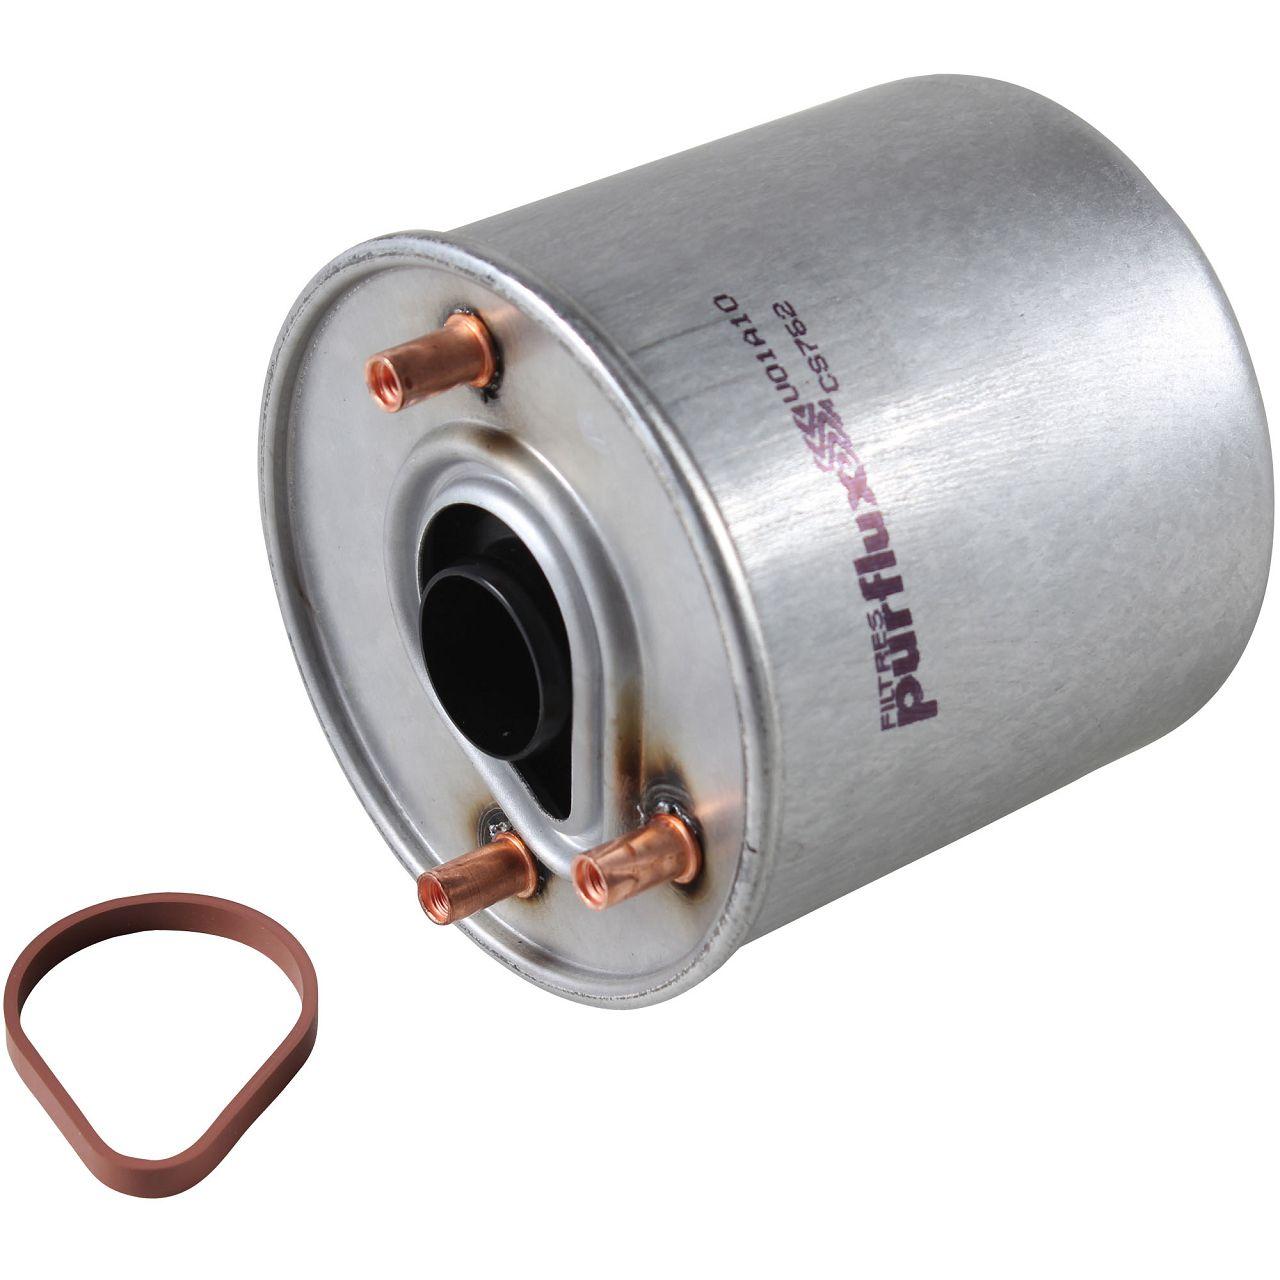 Inspektionskit Filterpaket Filterset CITROEN C3 2 DS3 PEUGEOT 207 208 1 2008 1 1.4/1.6 HDi